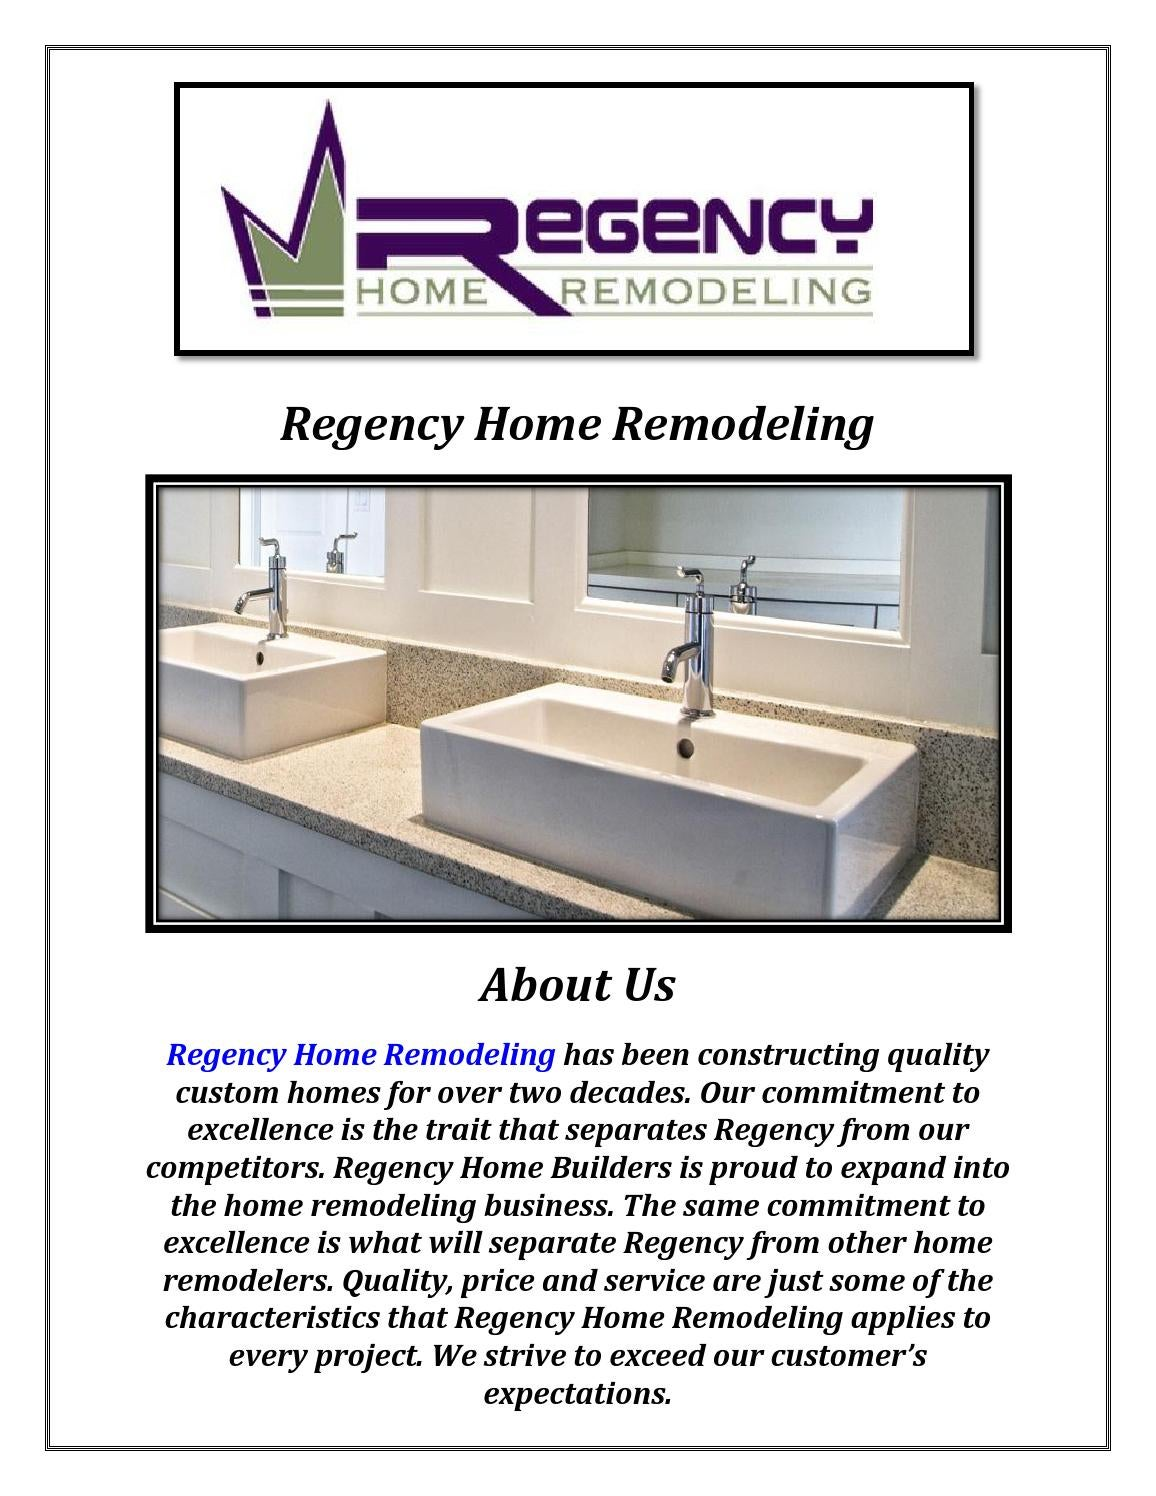 Regency home remodeling bathroom renovations arlington heights il by regency home remodeling for Bathroom remodeling arlington heights il